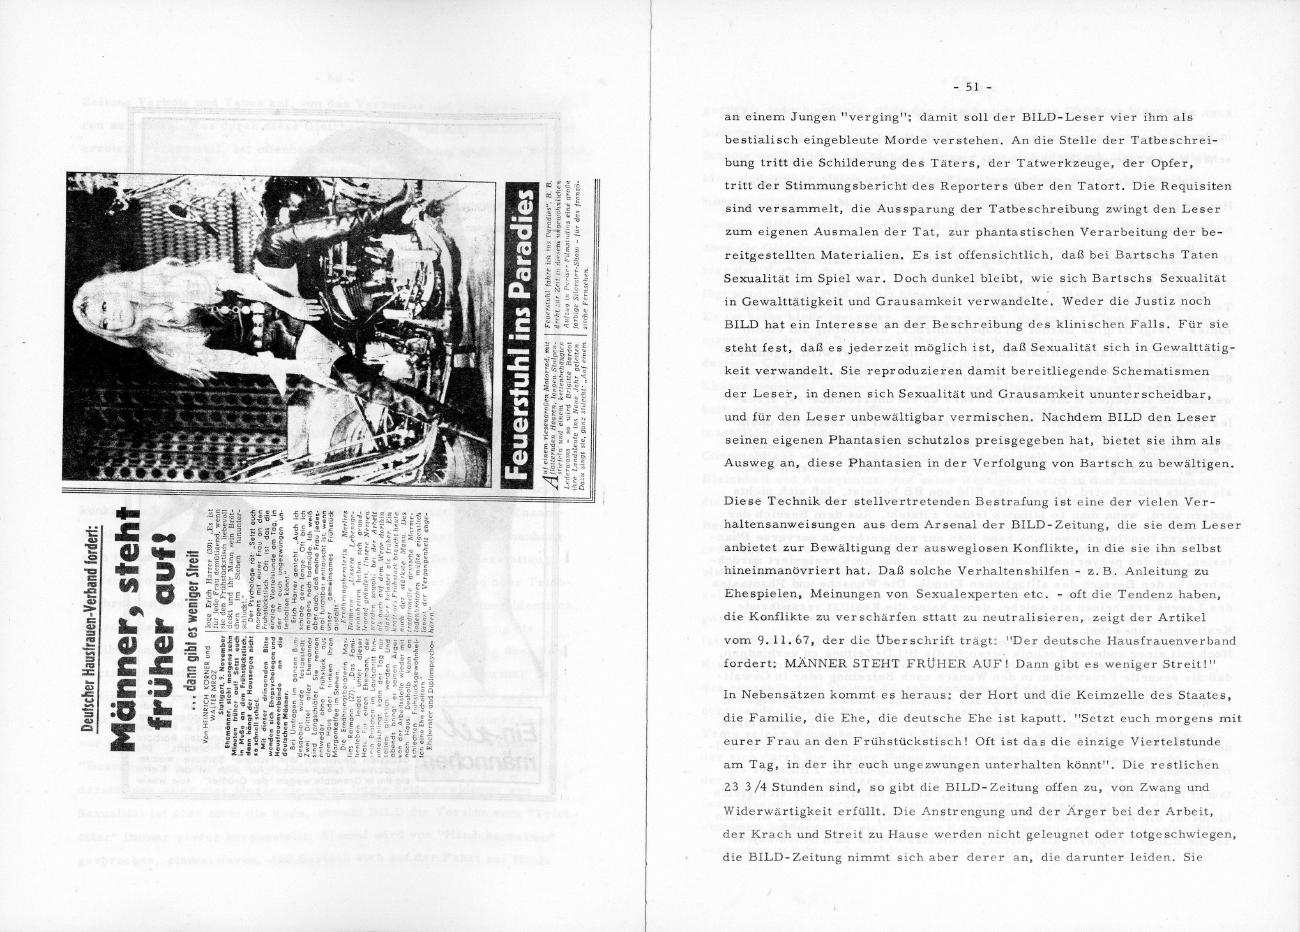 Berlin_SDS_1969_Bildzeitung_30